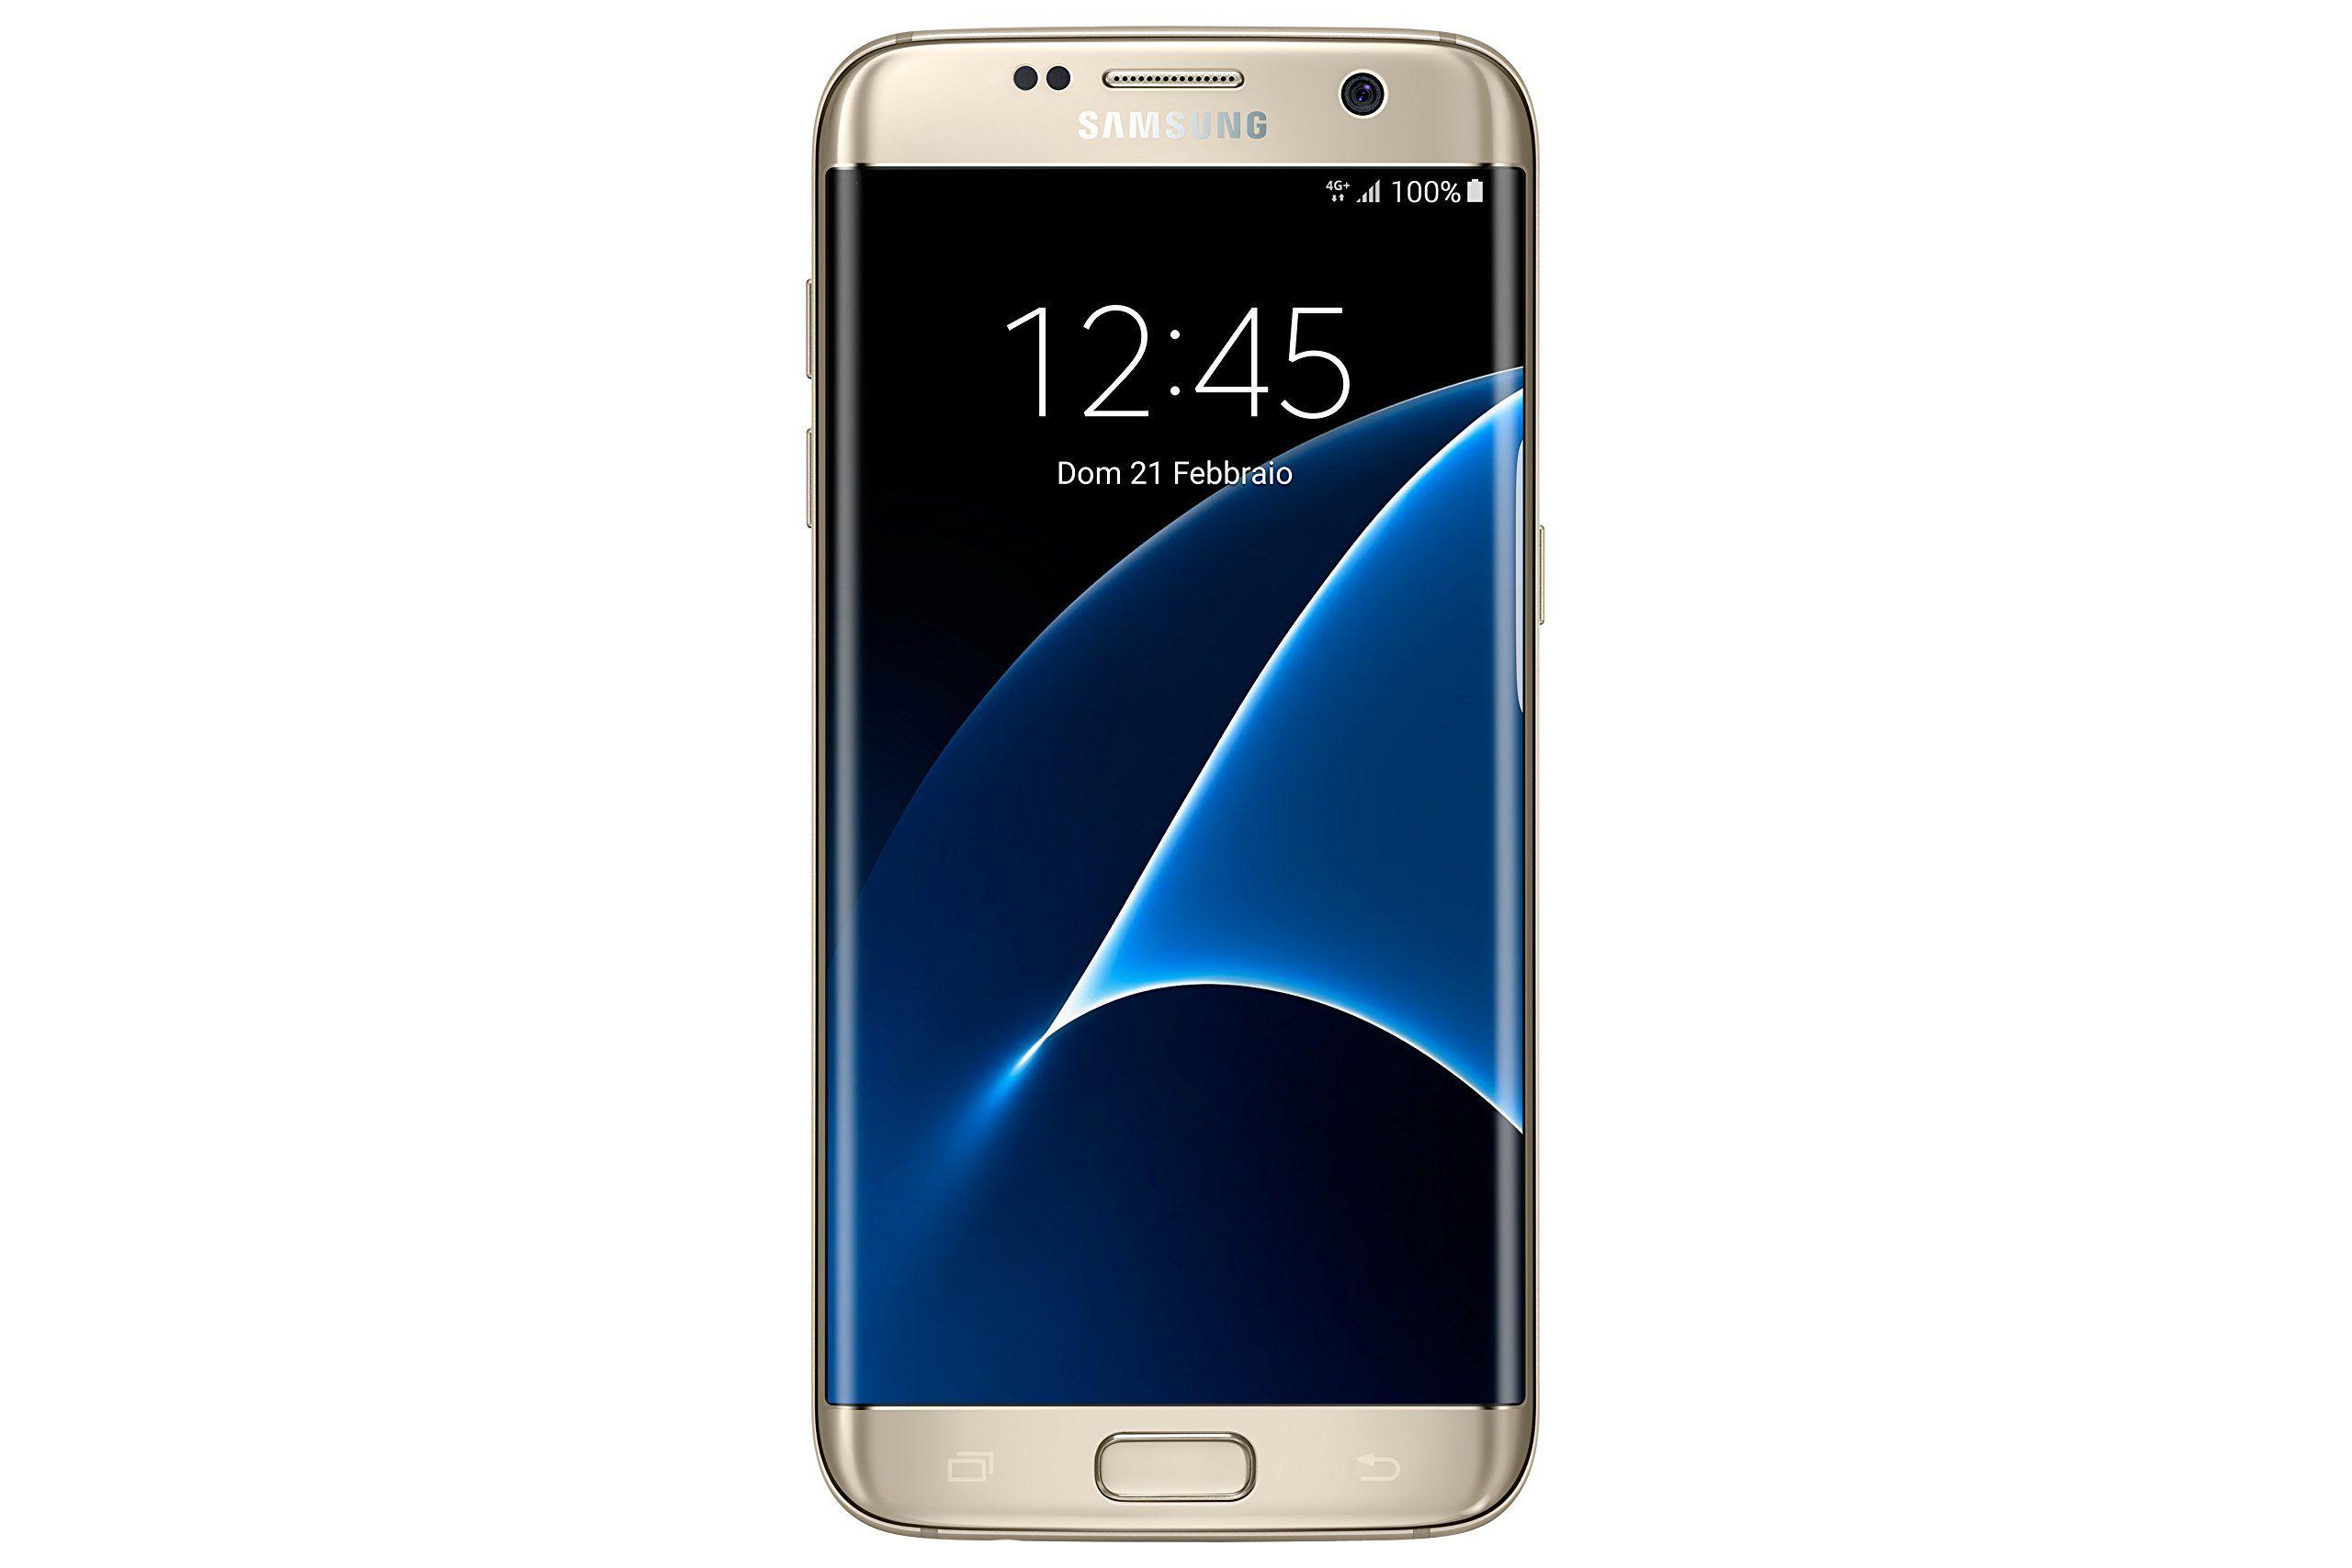 Samsung Galaxy S7 Edge G935 32gb Factory Unlocked Gsm Smartphone International Version No Warranty Gold